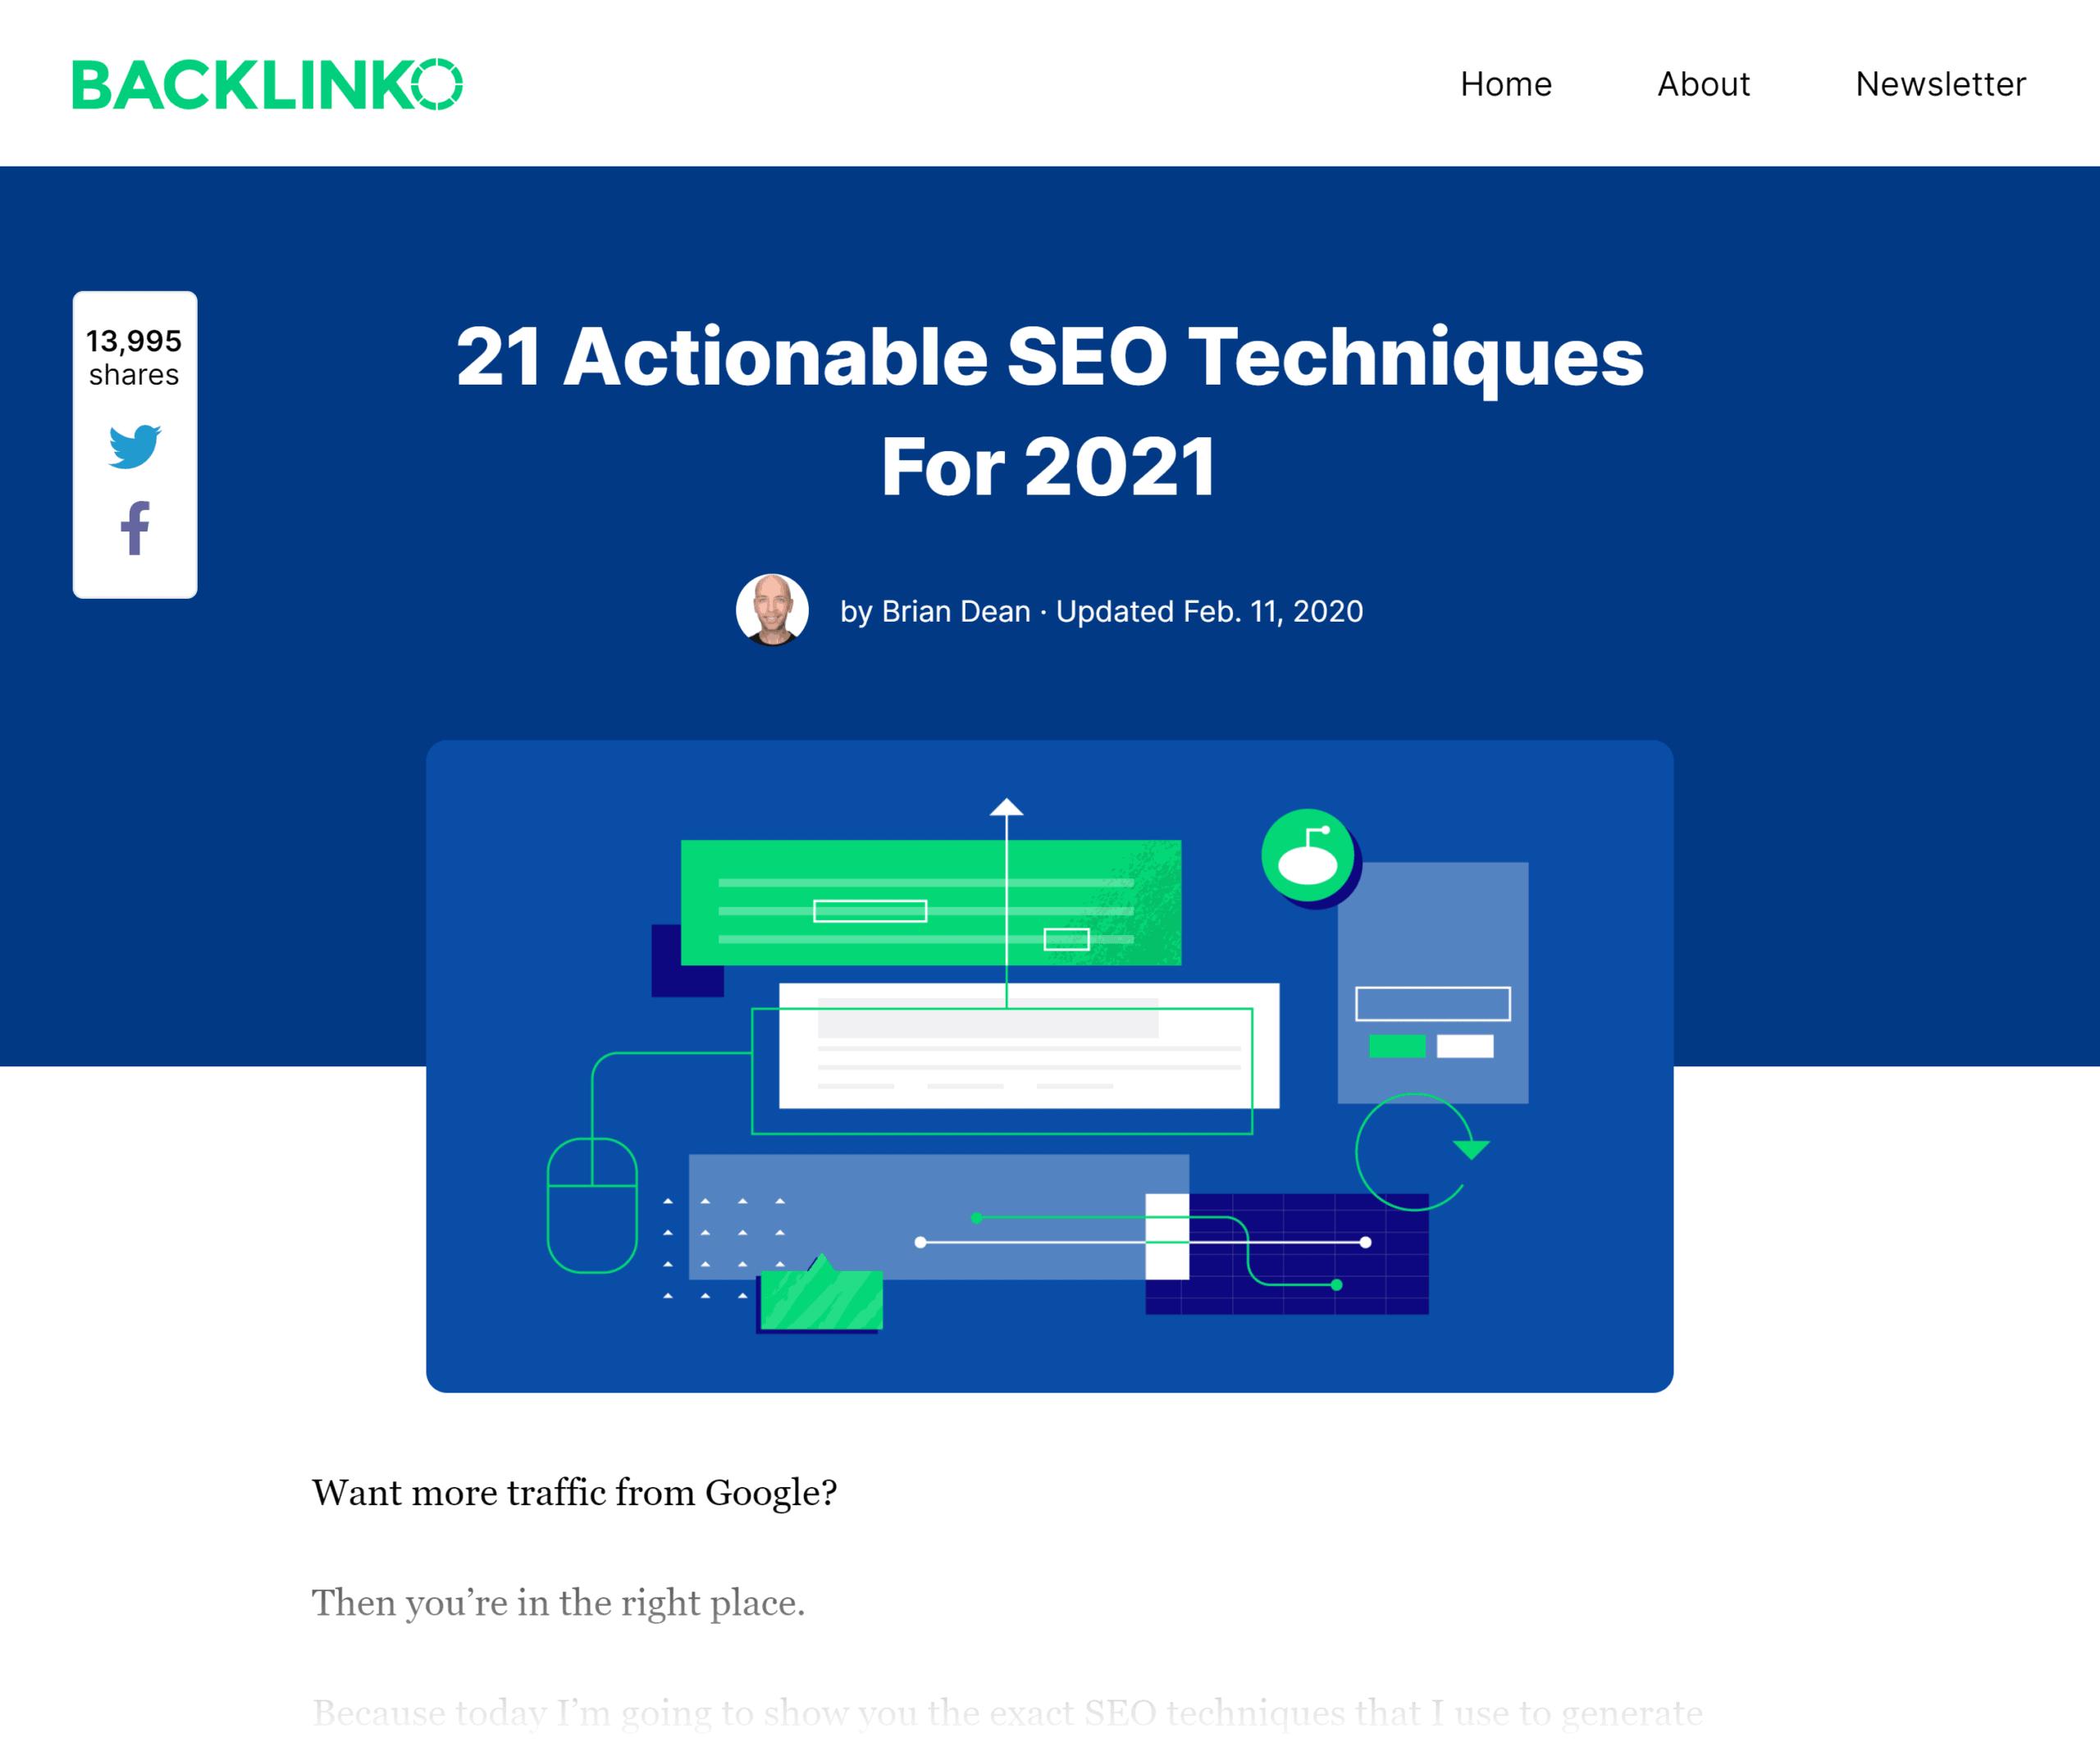 Backlinko – SEO techniques